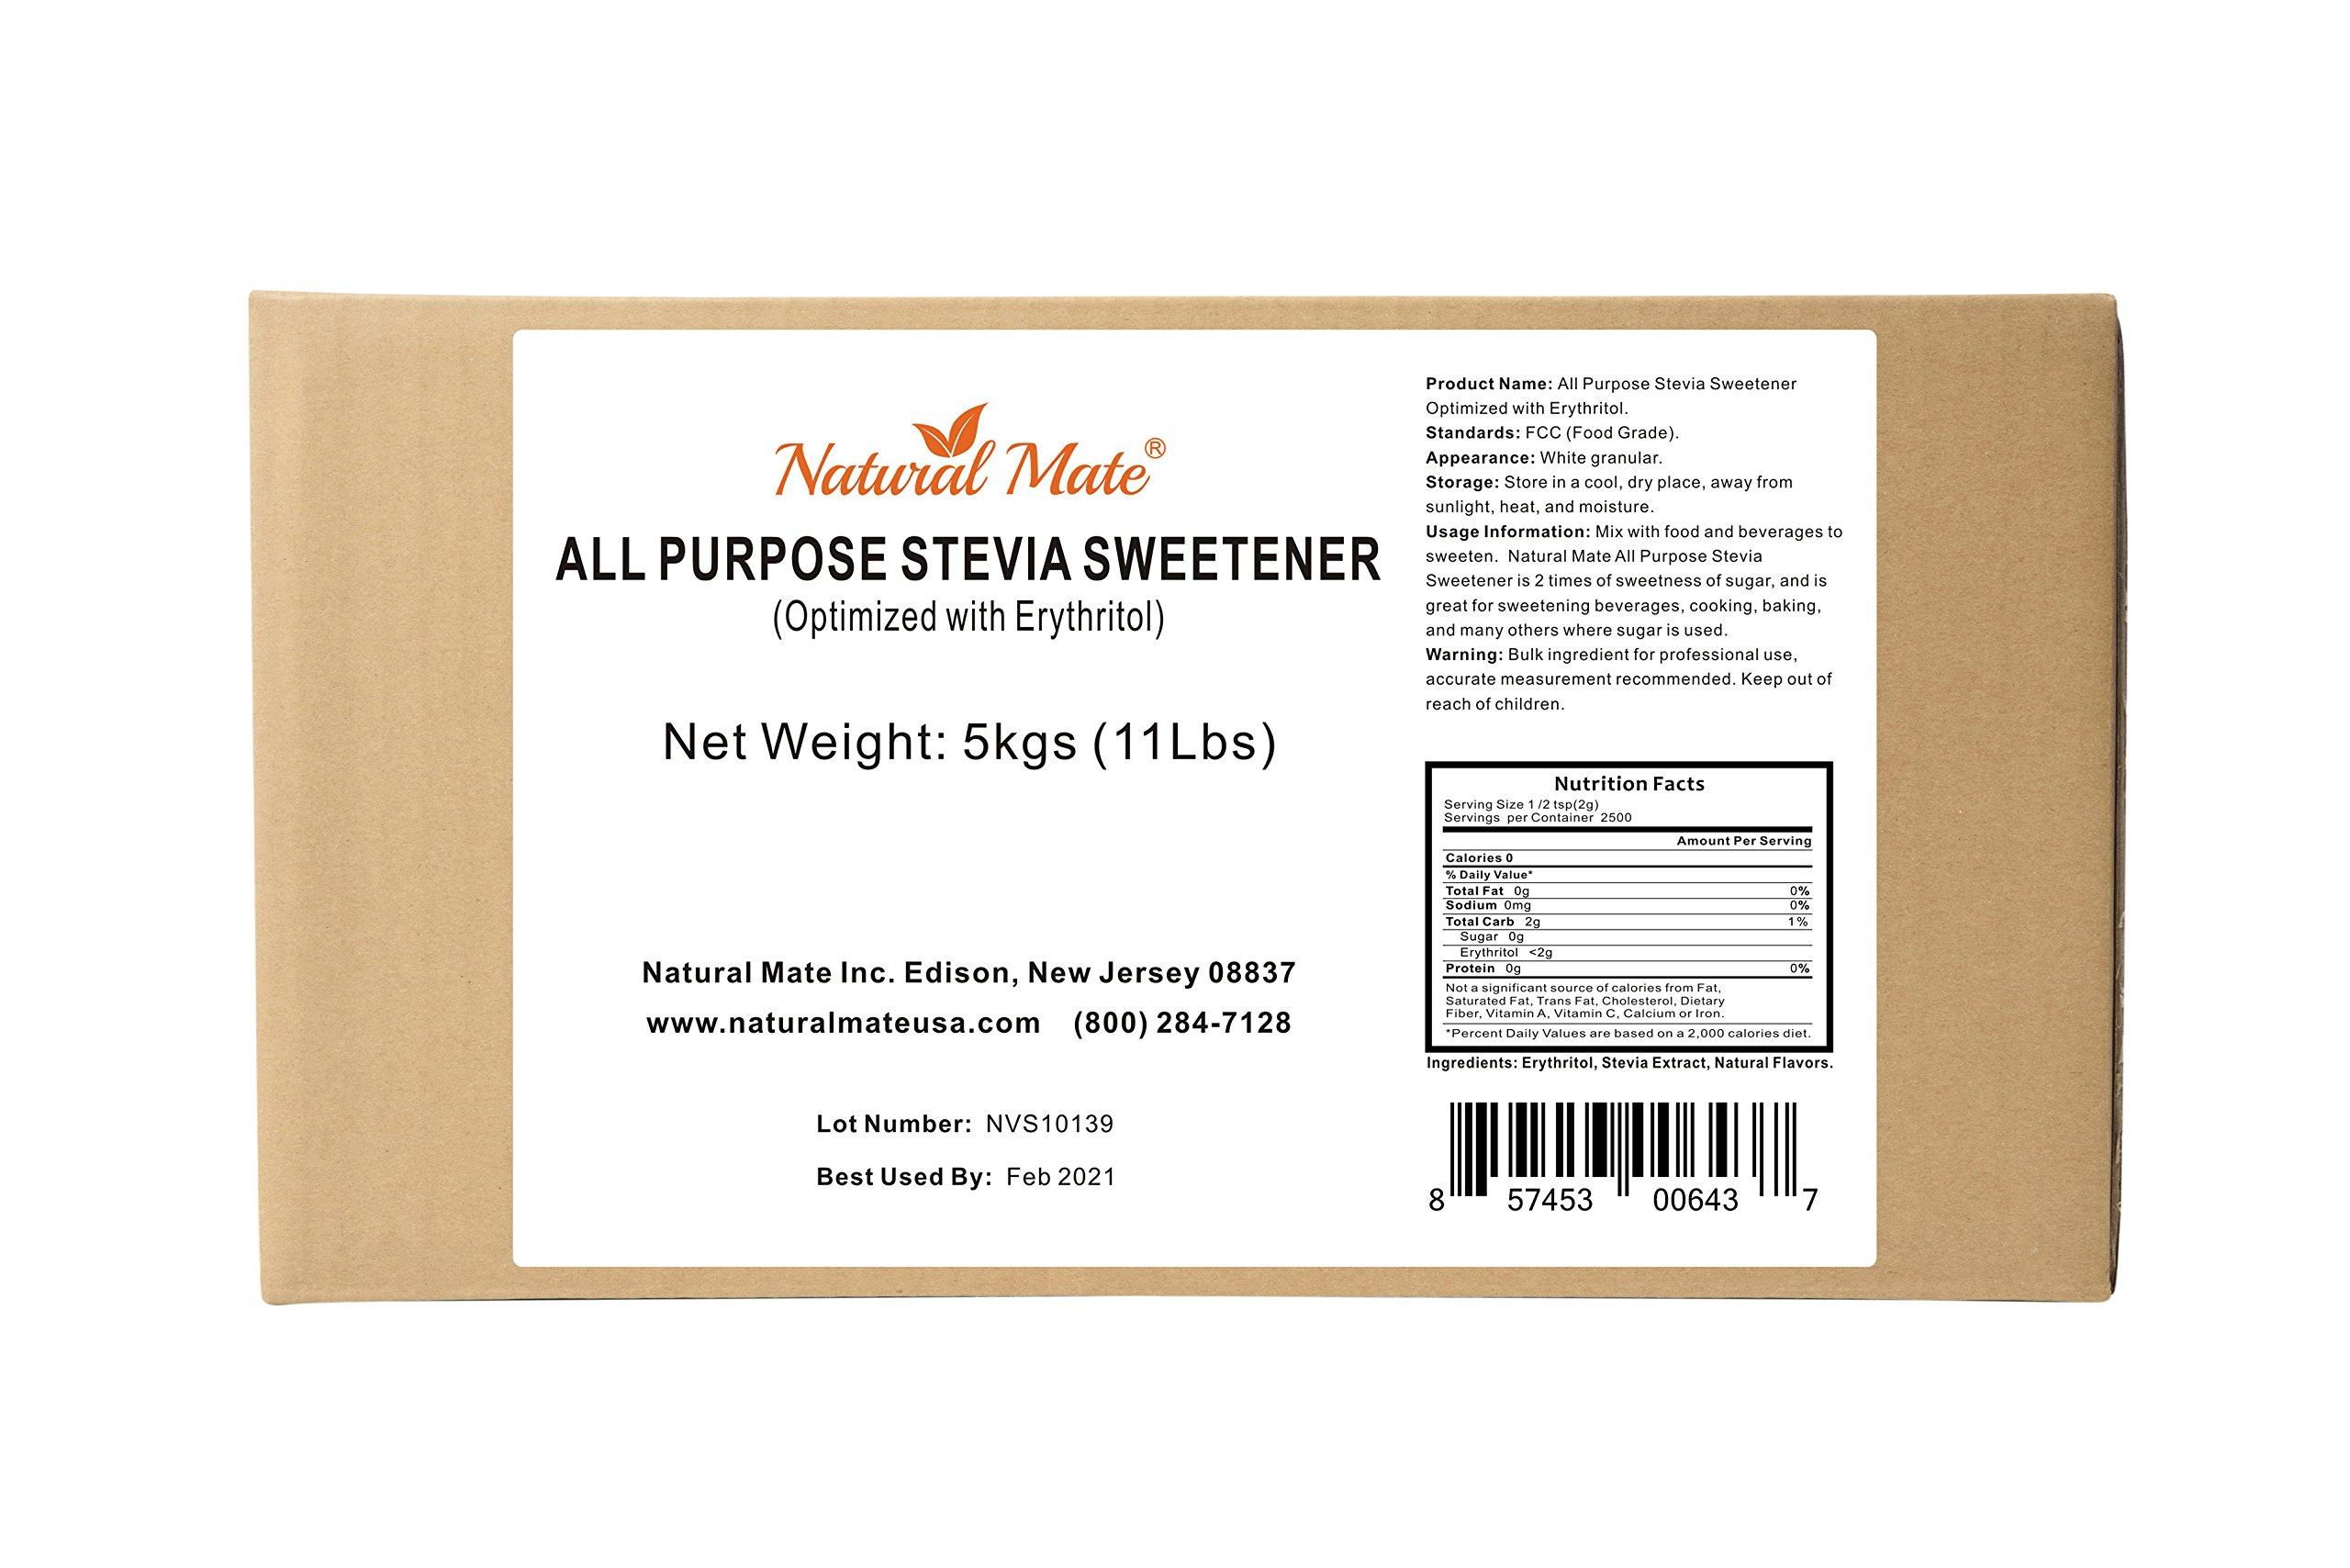 Natural Mate Stevia All Purpose Natural Sweetener, 5kgs/11Lbs   Free Gift: Monk Fruit Sweetener (10oz) by Natural Mate (Image #2)